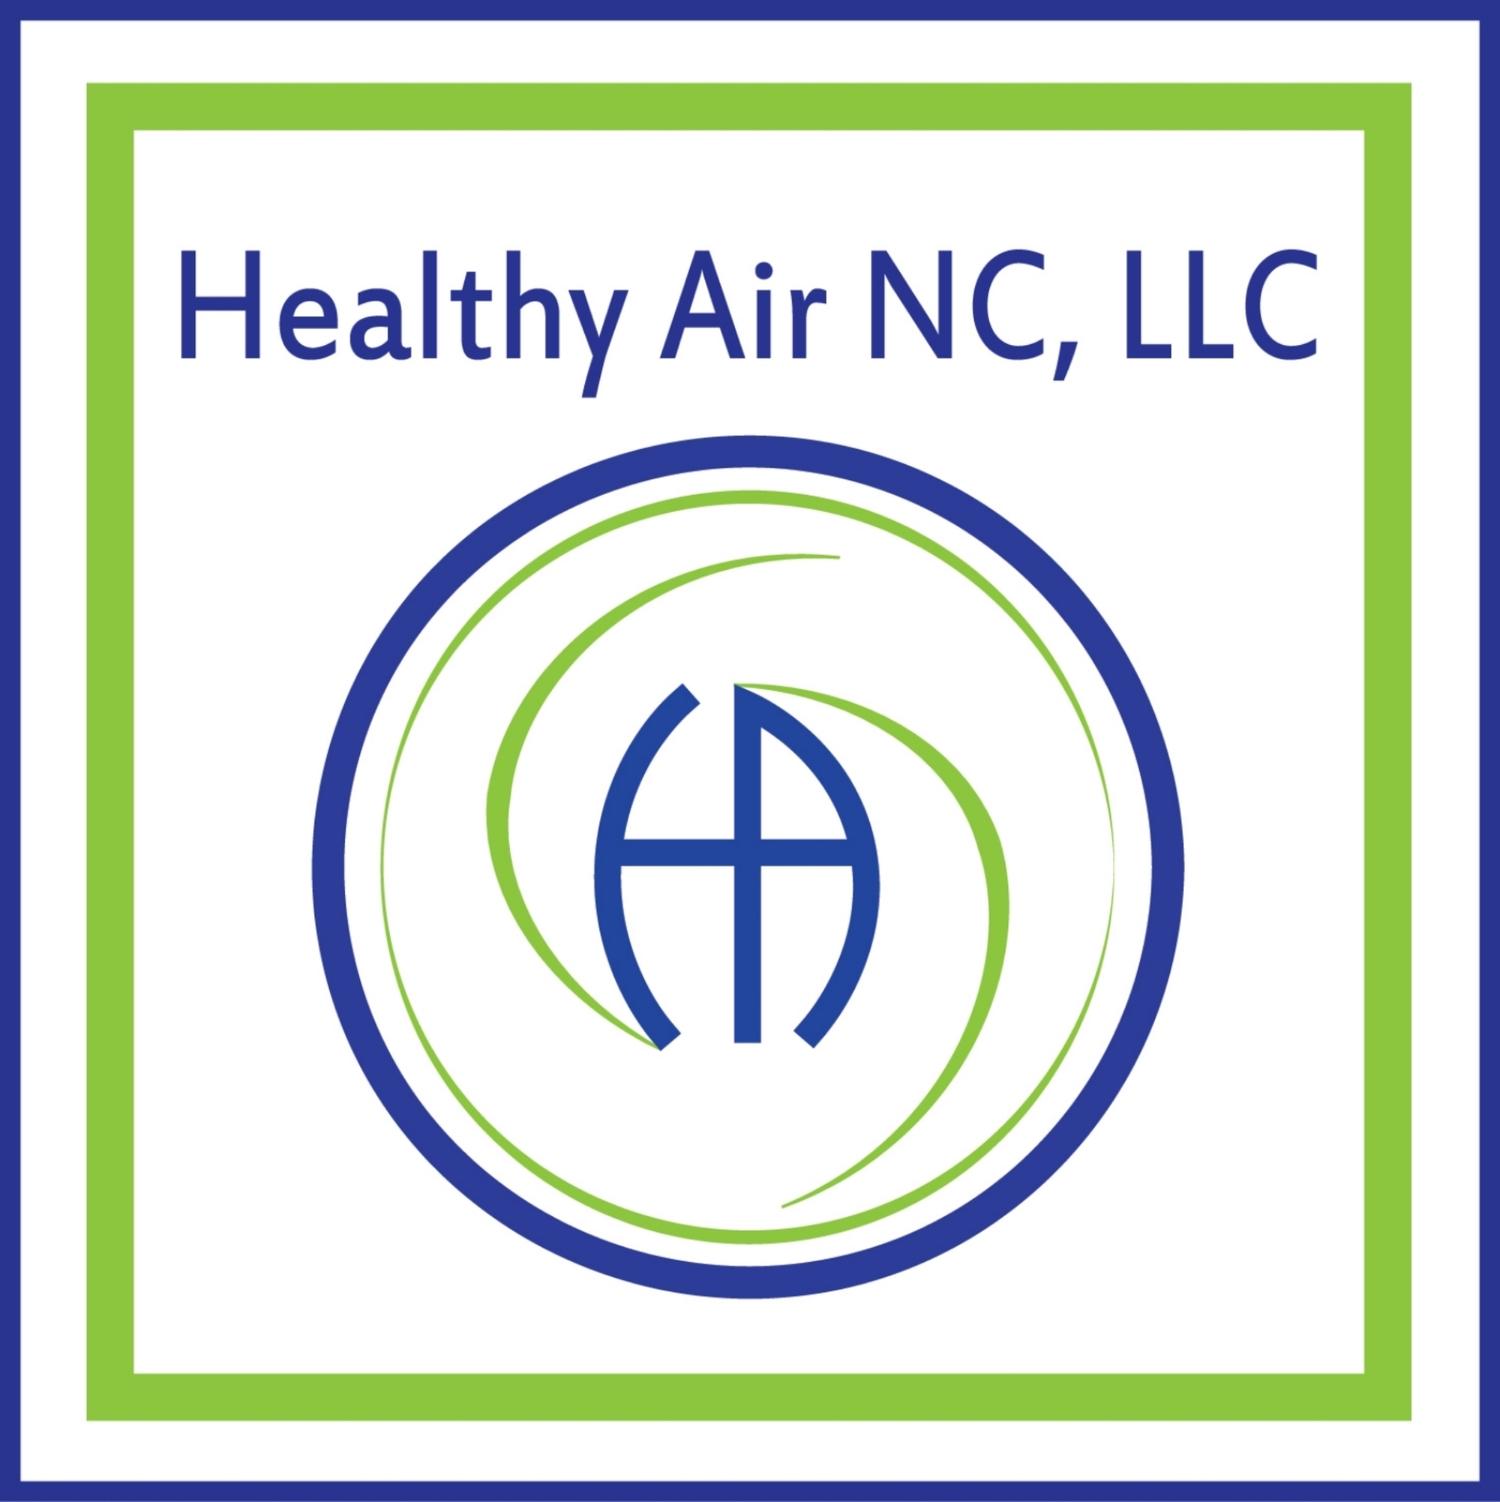 Healthy air nc llc home healthy air nc llc buycottarizona Image collections